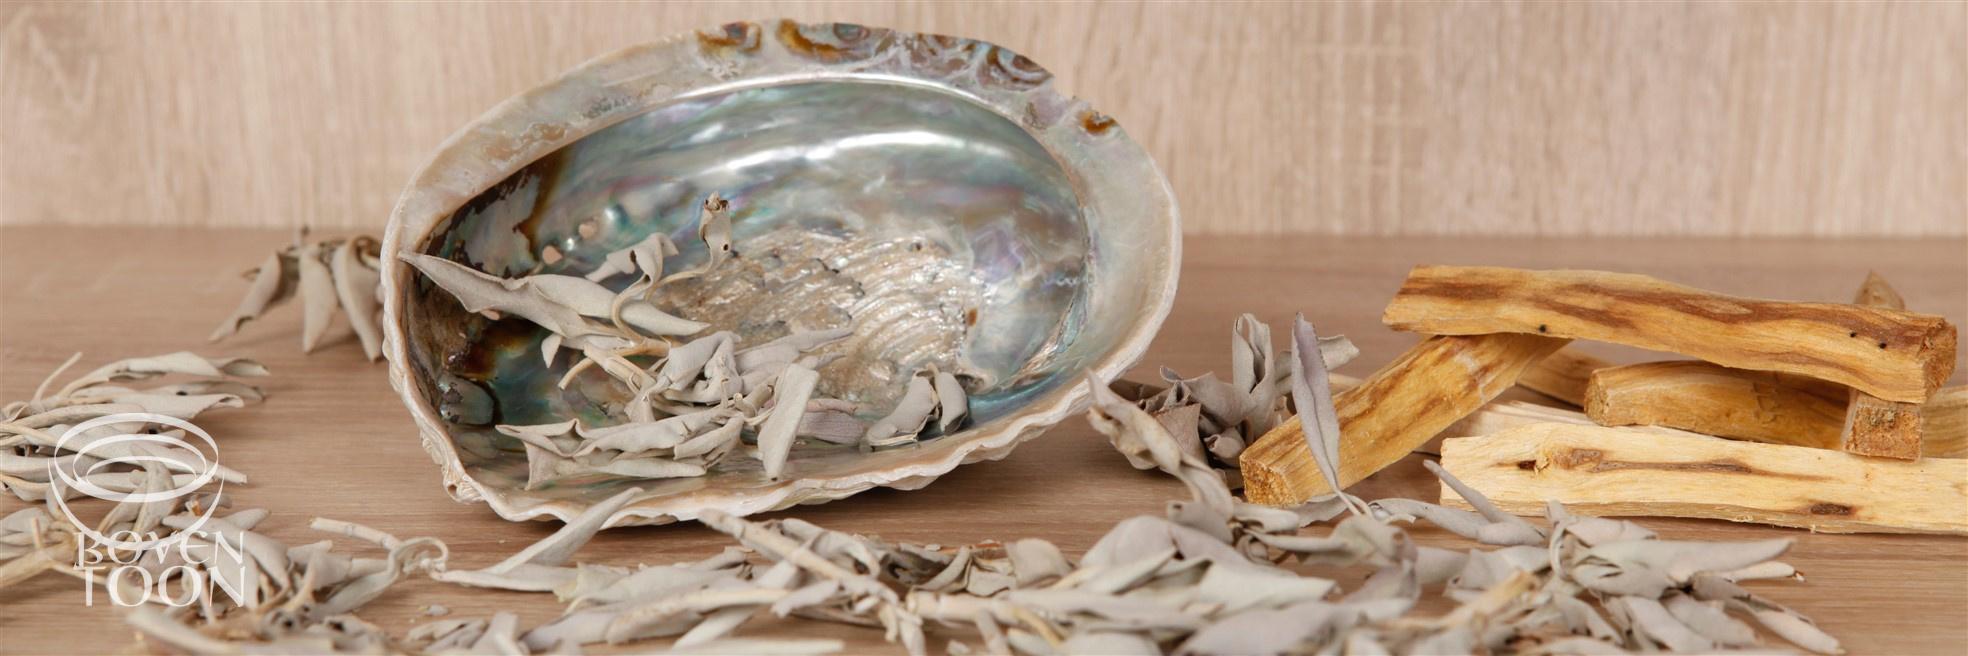 Witte salie, palo santo, abaloneschelp Boventoon